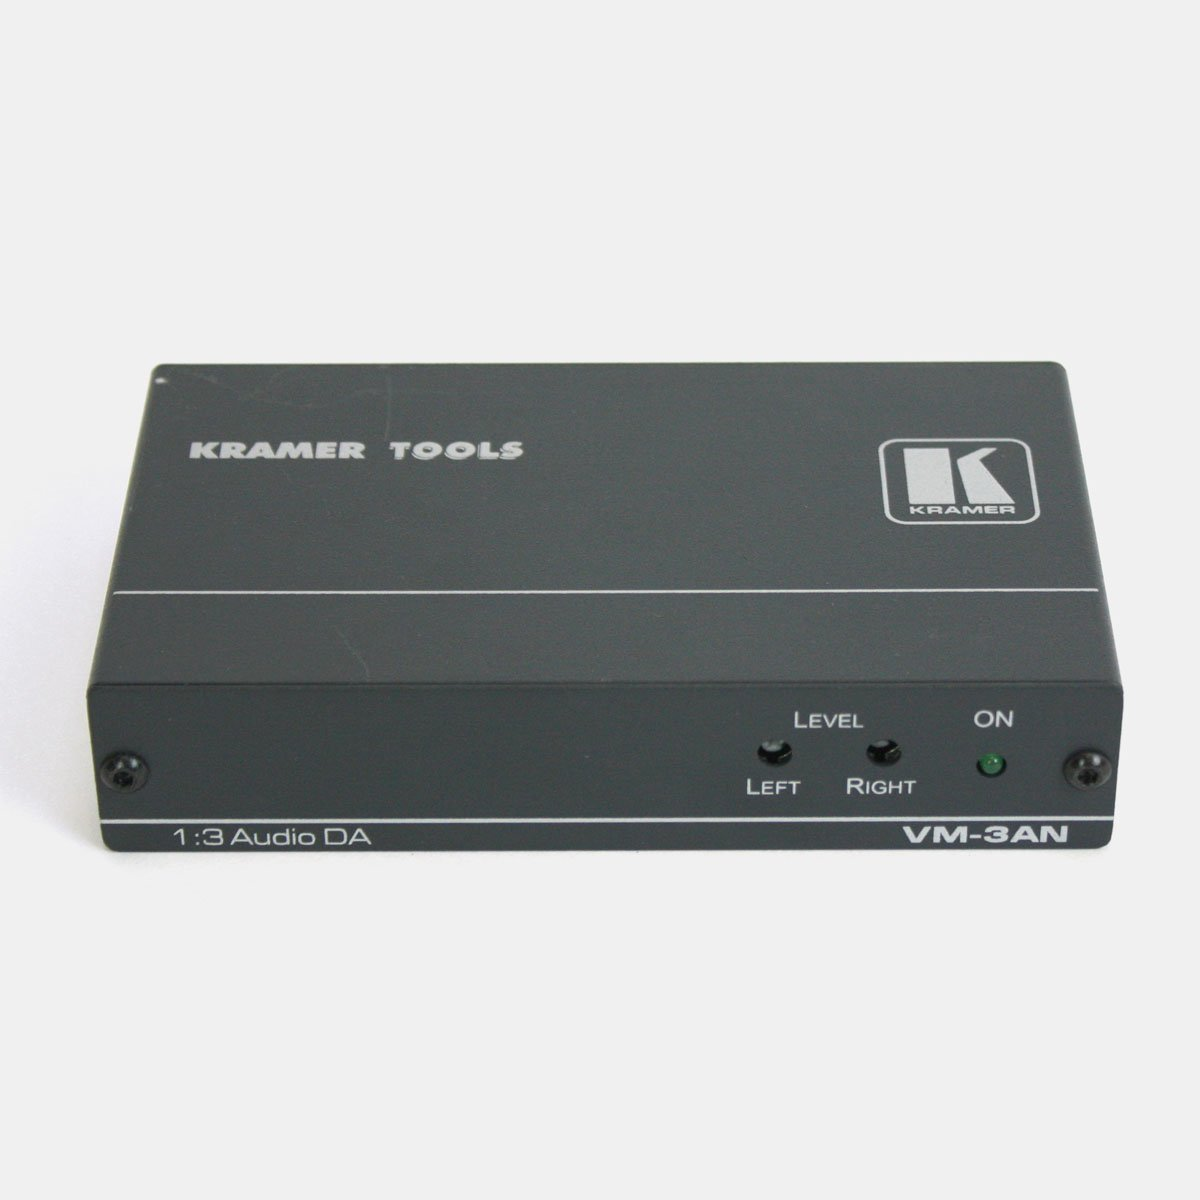 Used Kramer VM-3AN 1:3 Balanced Stereo Audio DA